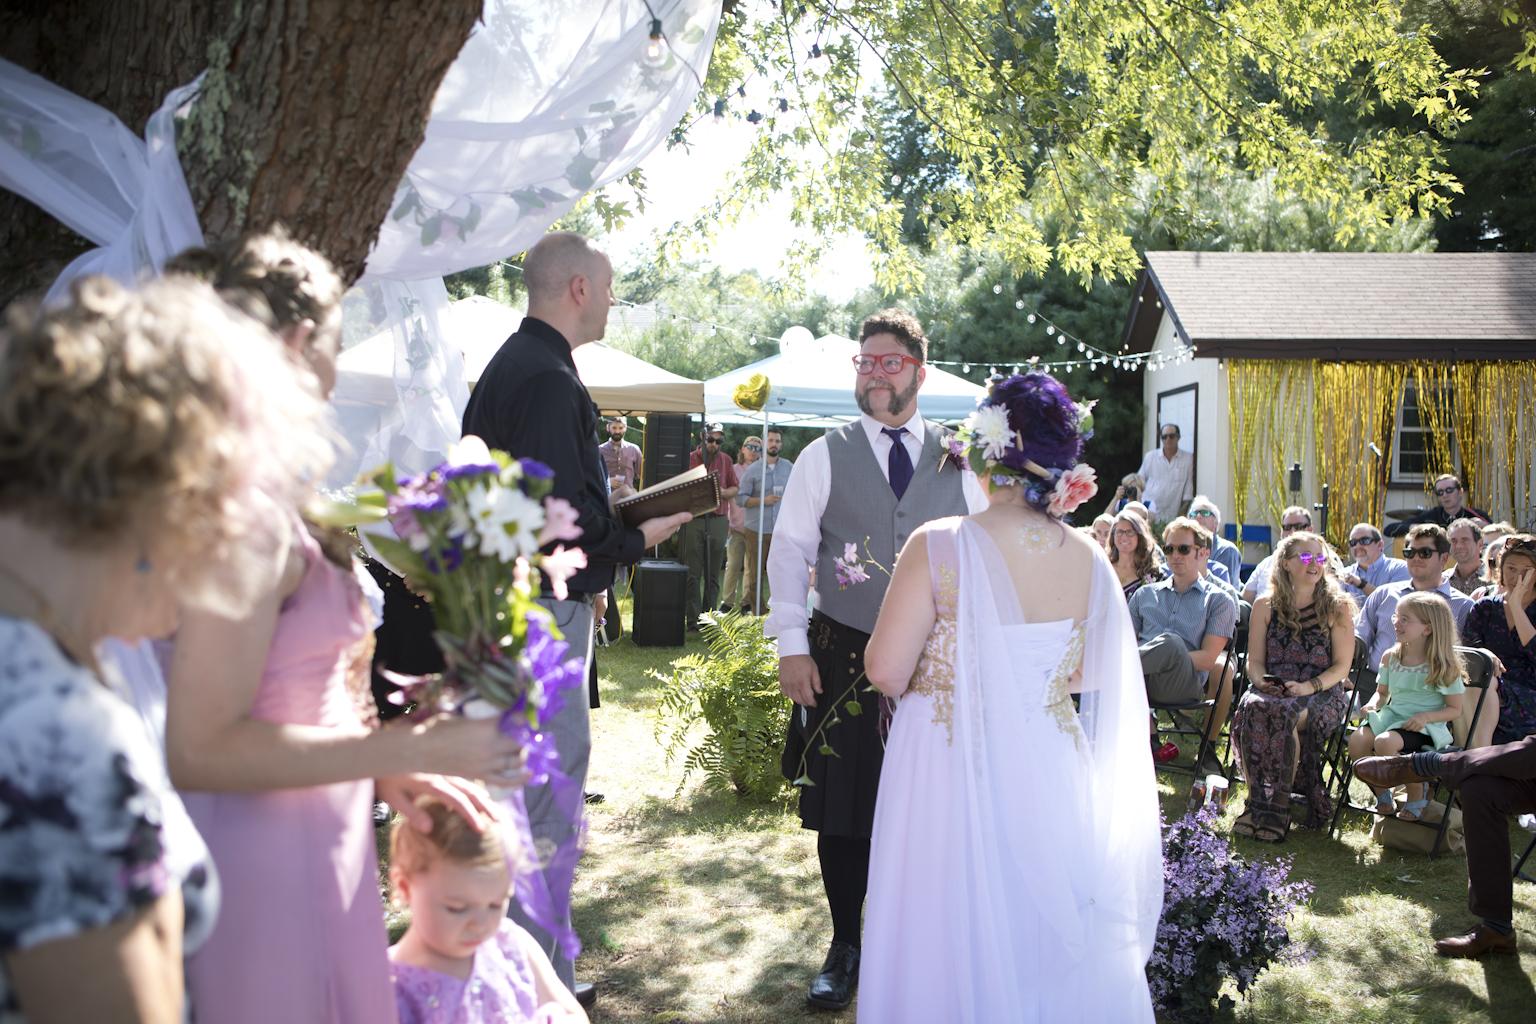 Tina and Adam wedding_Studio Misha Wedding Photography Asheville Photographer and Videographer00058.JPG